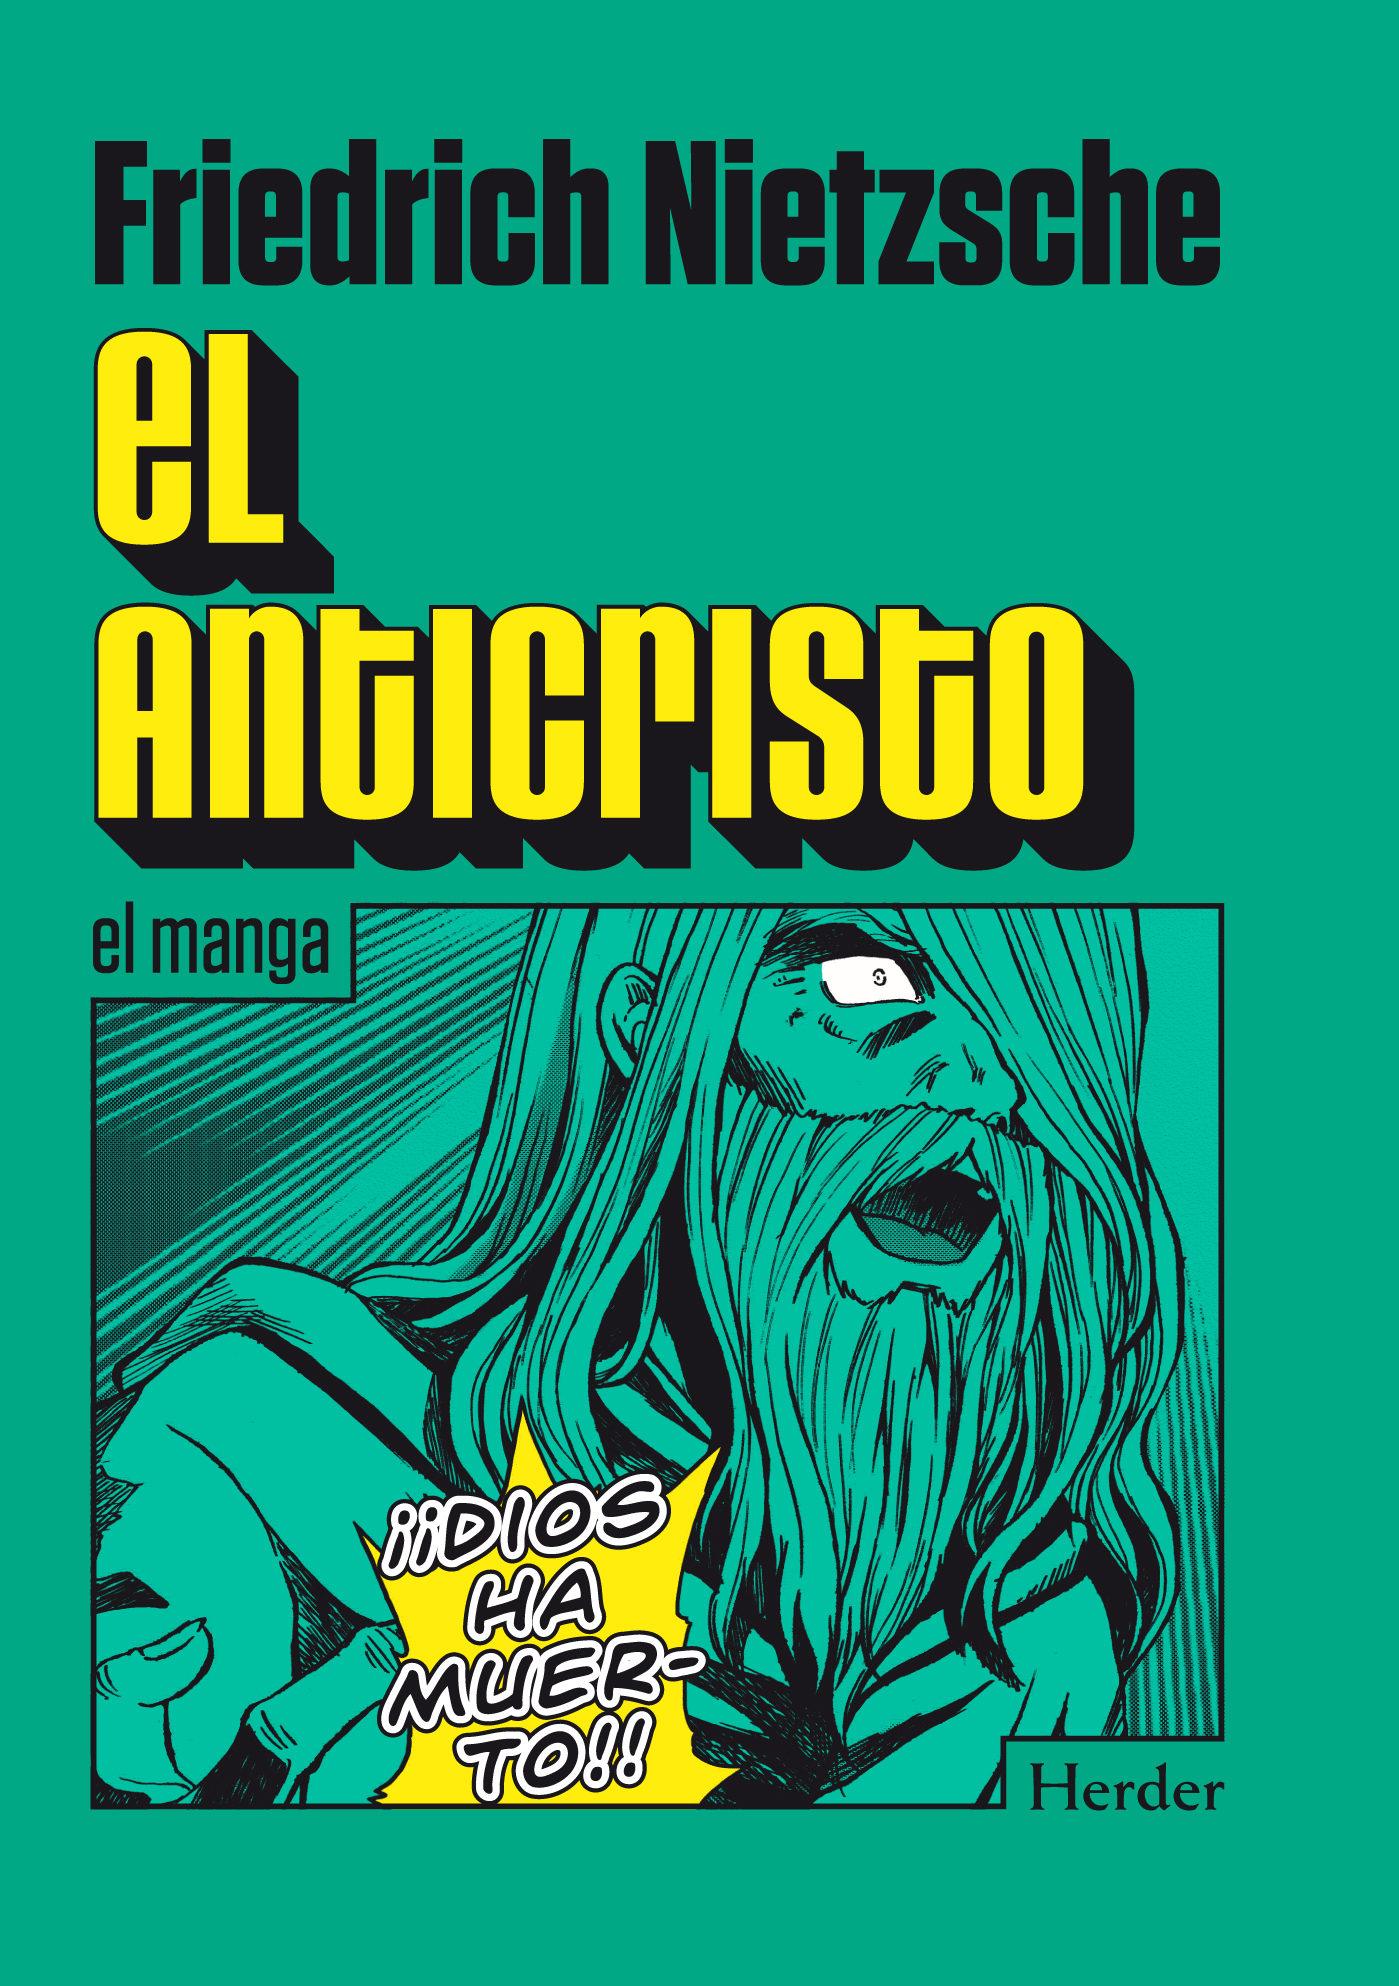 El anticristo manga friederich nietzsche 9788425433399